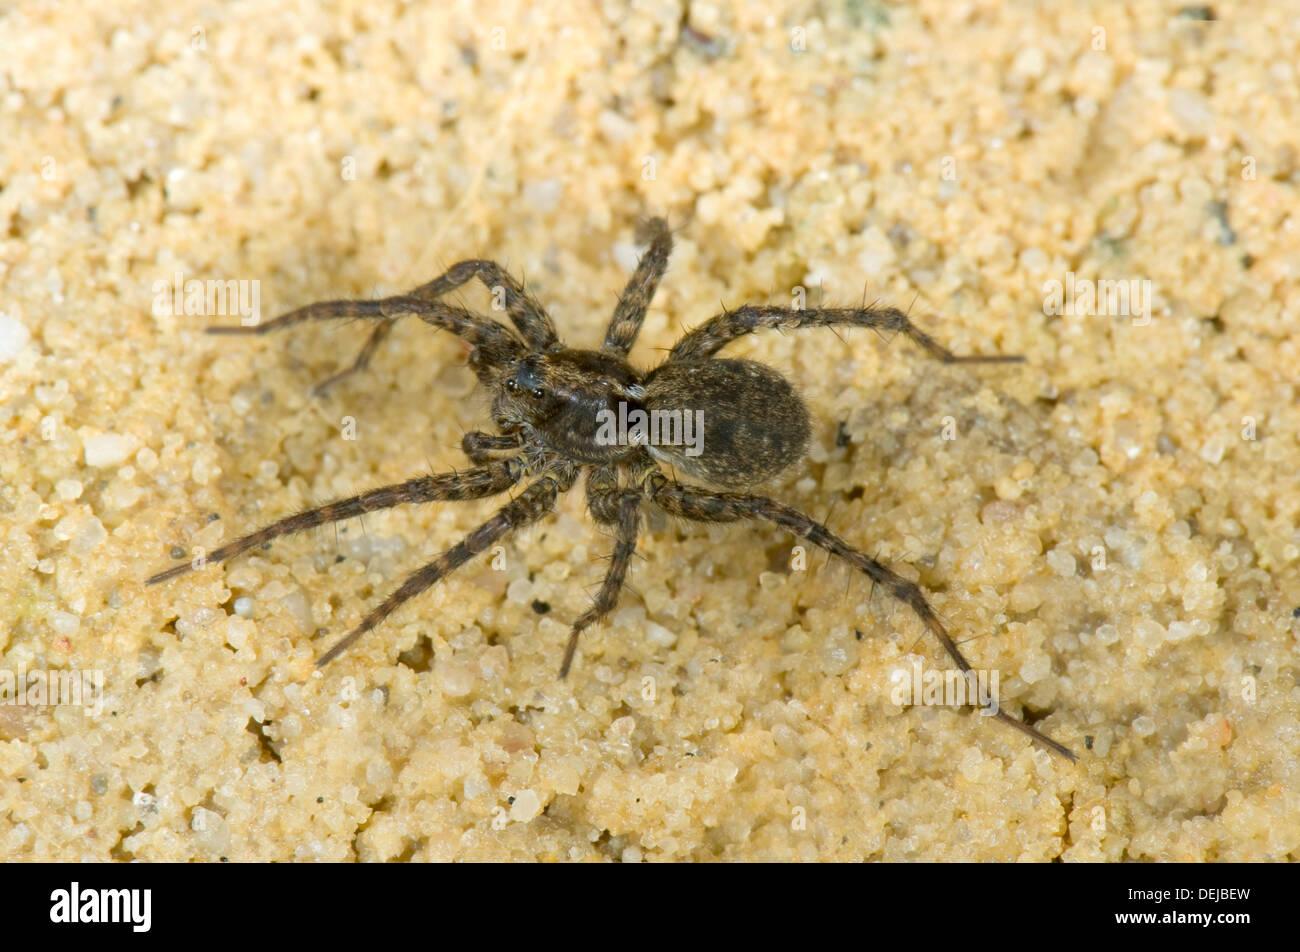 A wolf spider, Pardosa amentata, - Stock Image